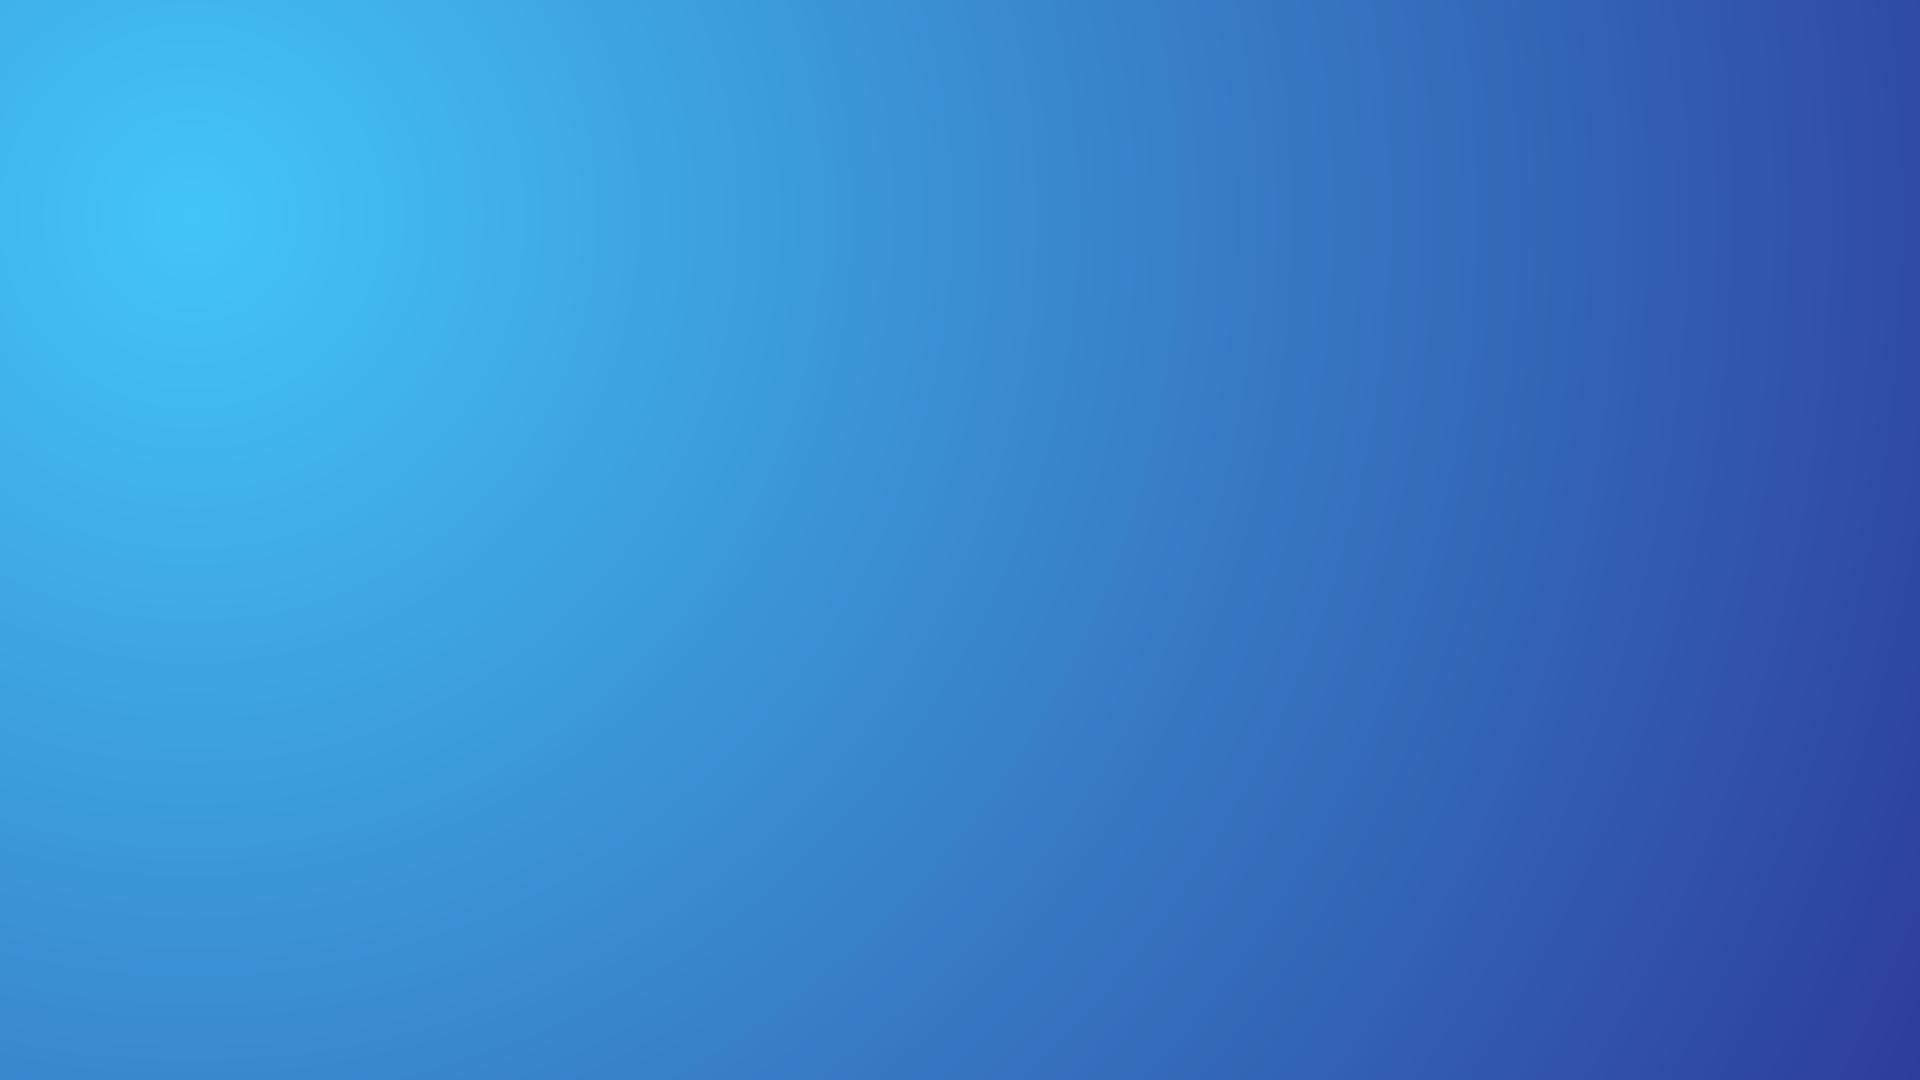 Grand Blue Gradient